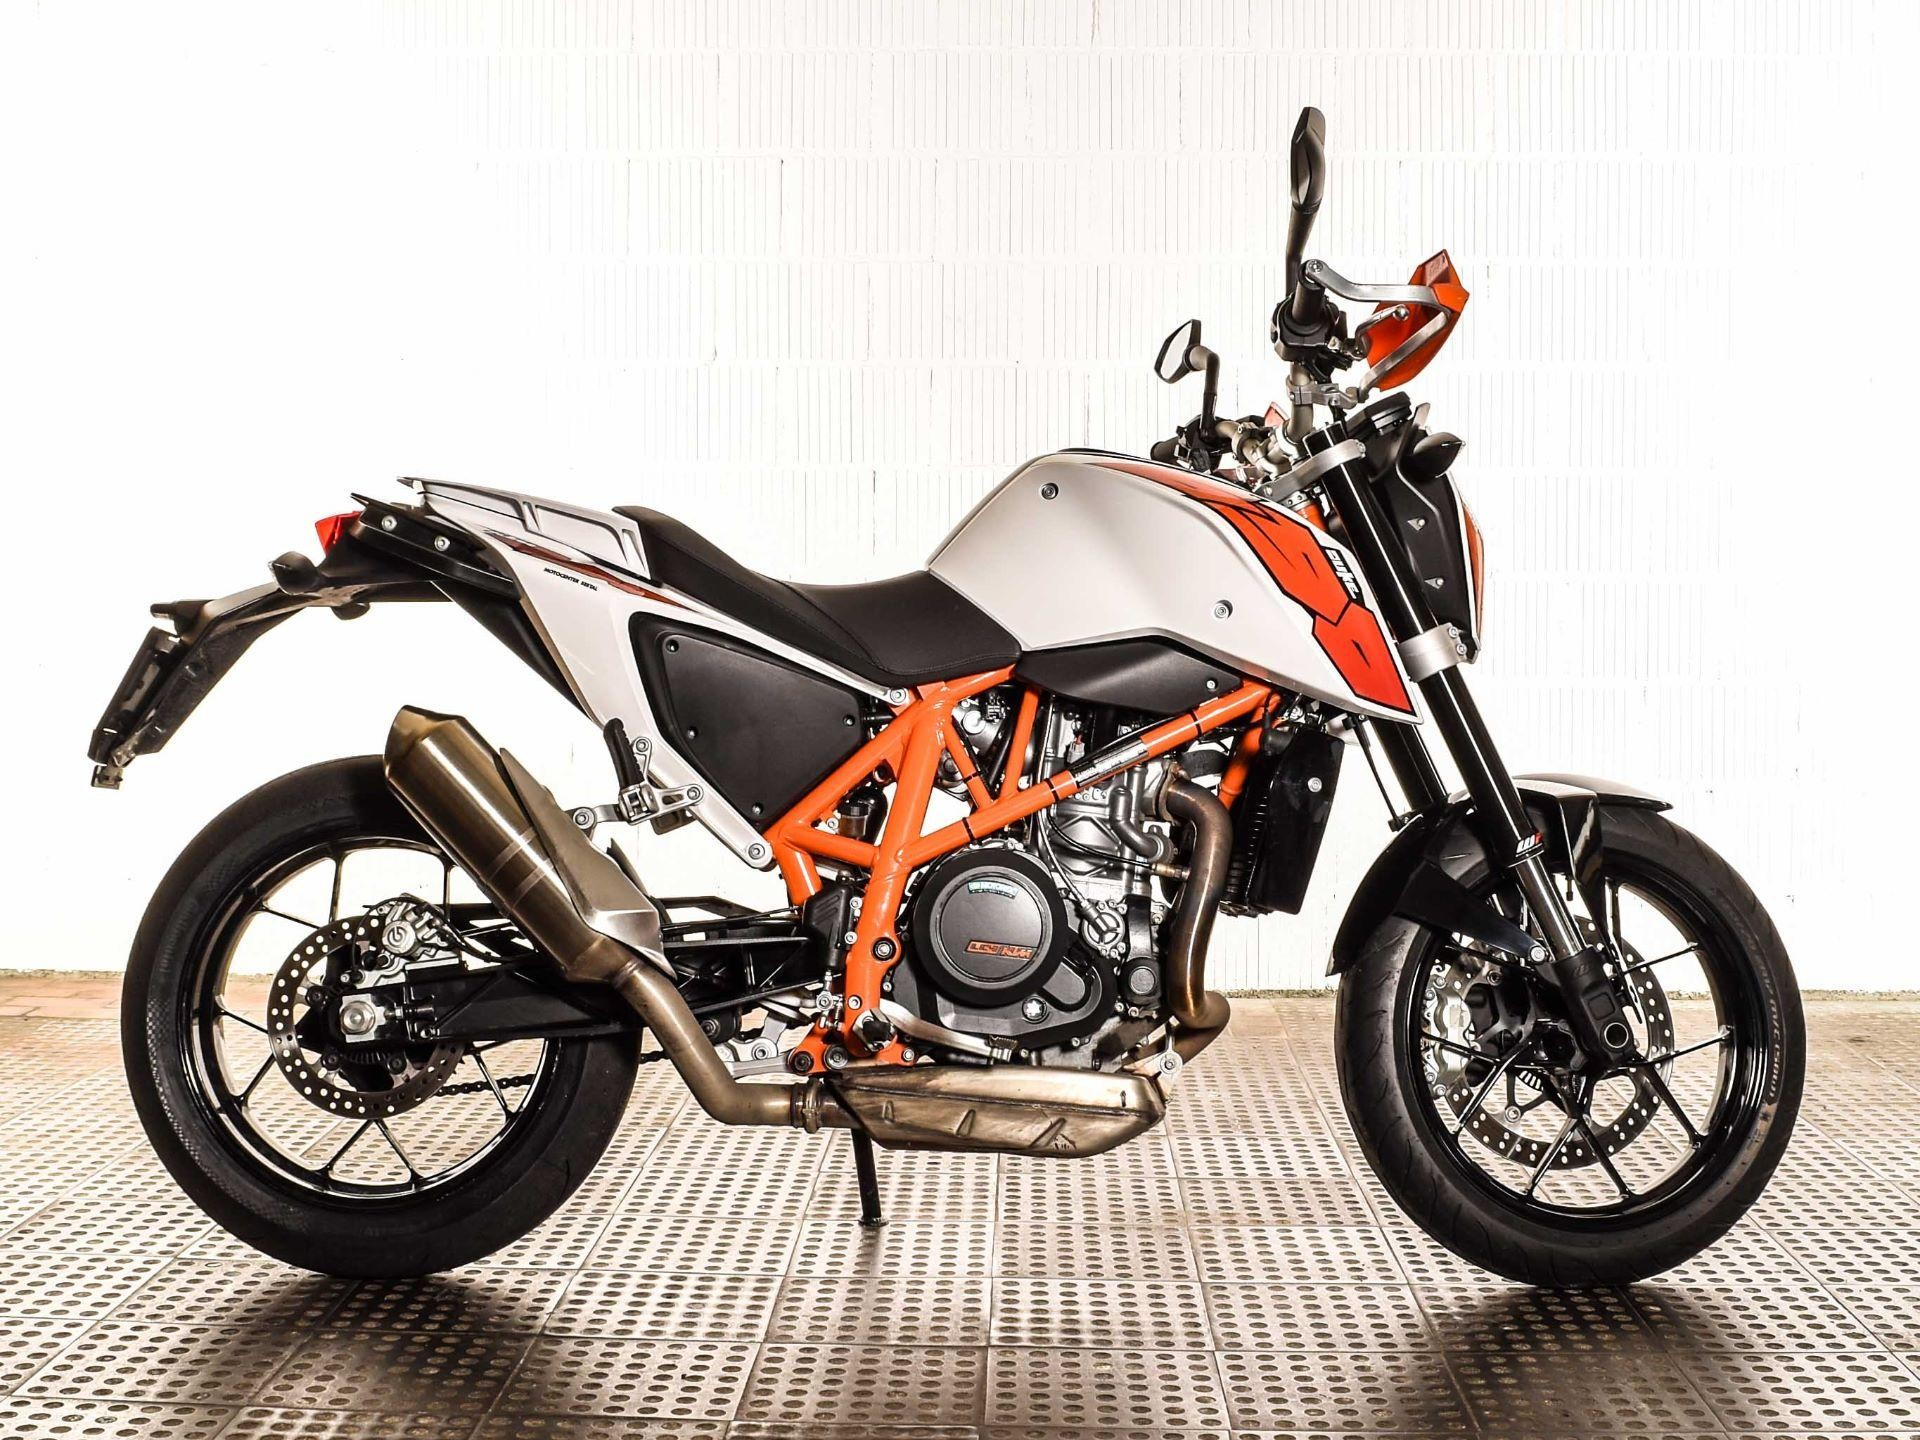 motorrad occasion kaufen ktm 690 duke abs motocenter seetal hochdorf. Black Bedroom Furniture Sets. Home Design Ideas